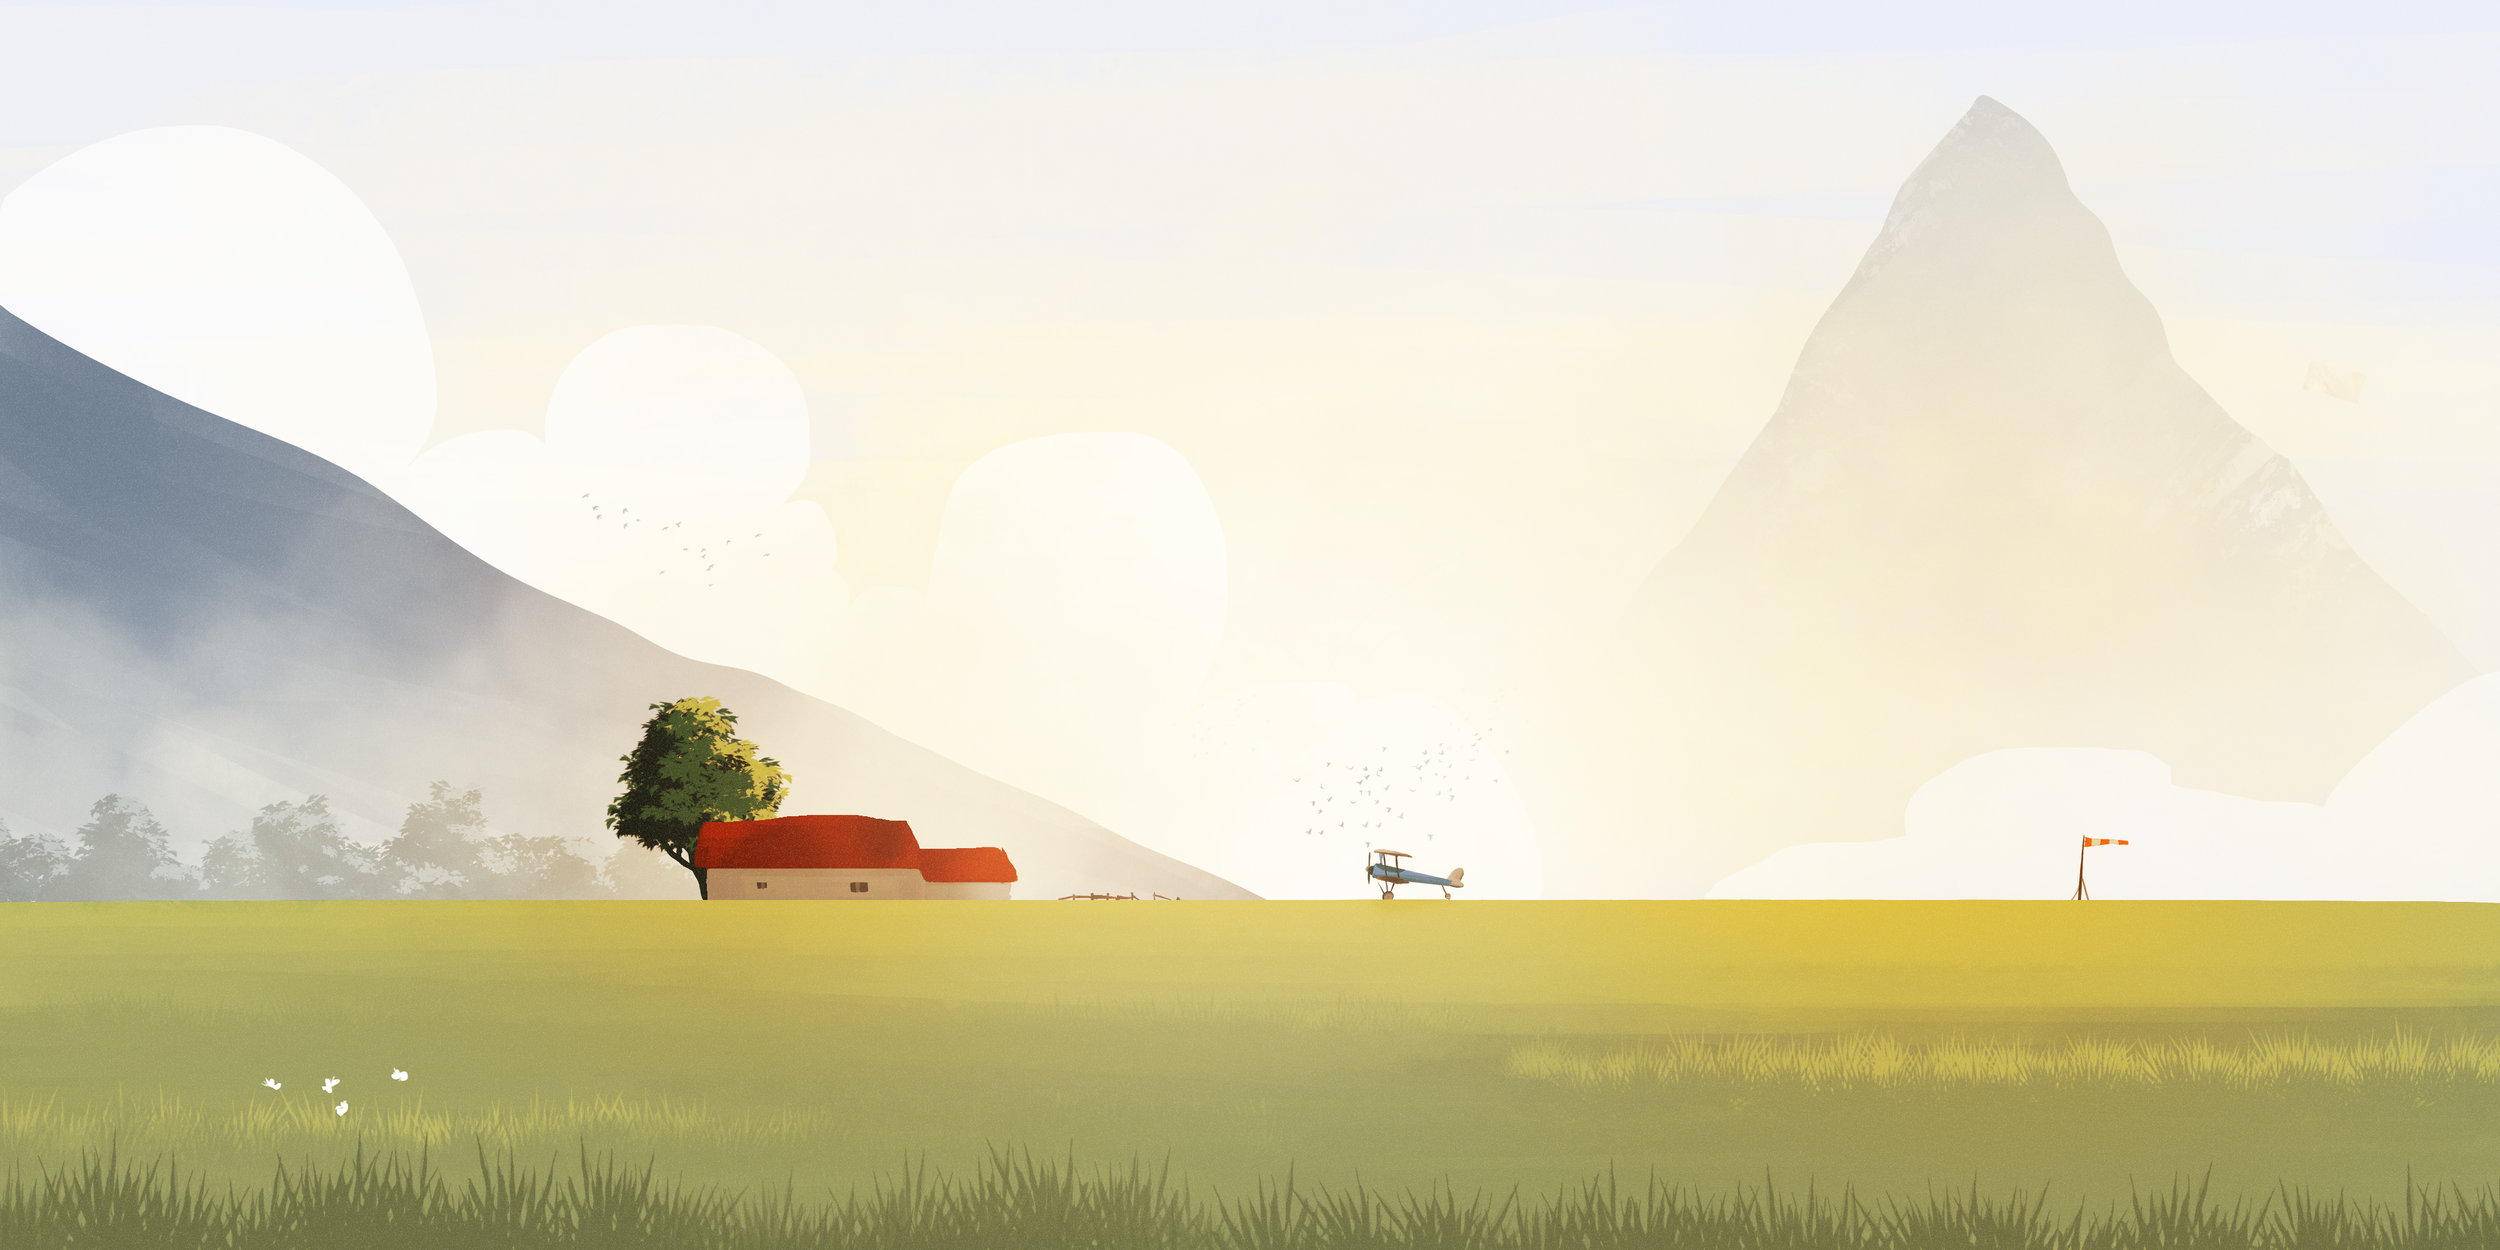 Field_house_plane.jpg